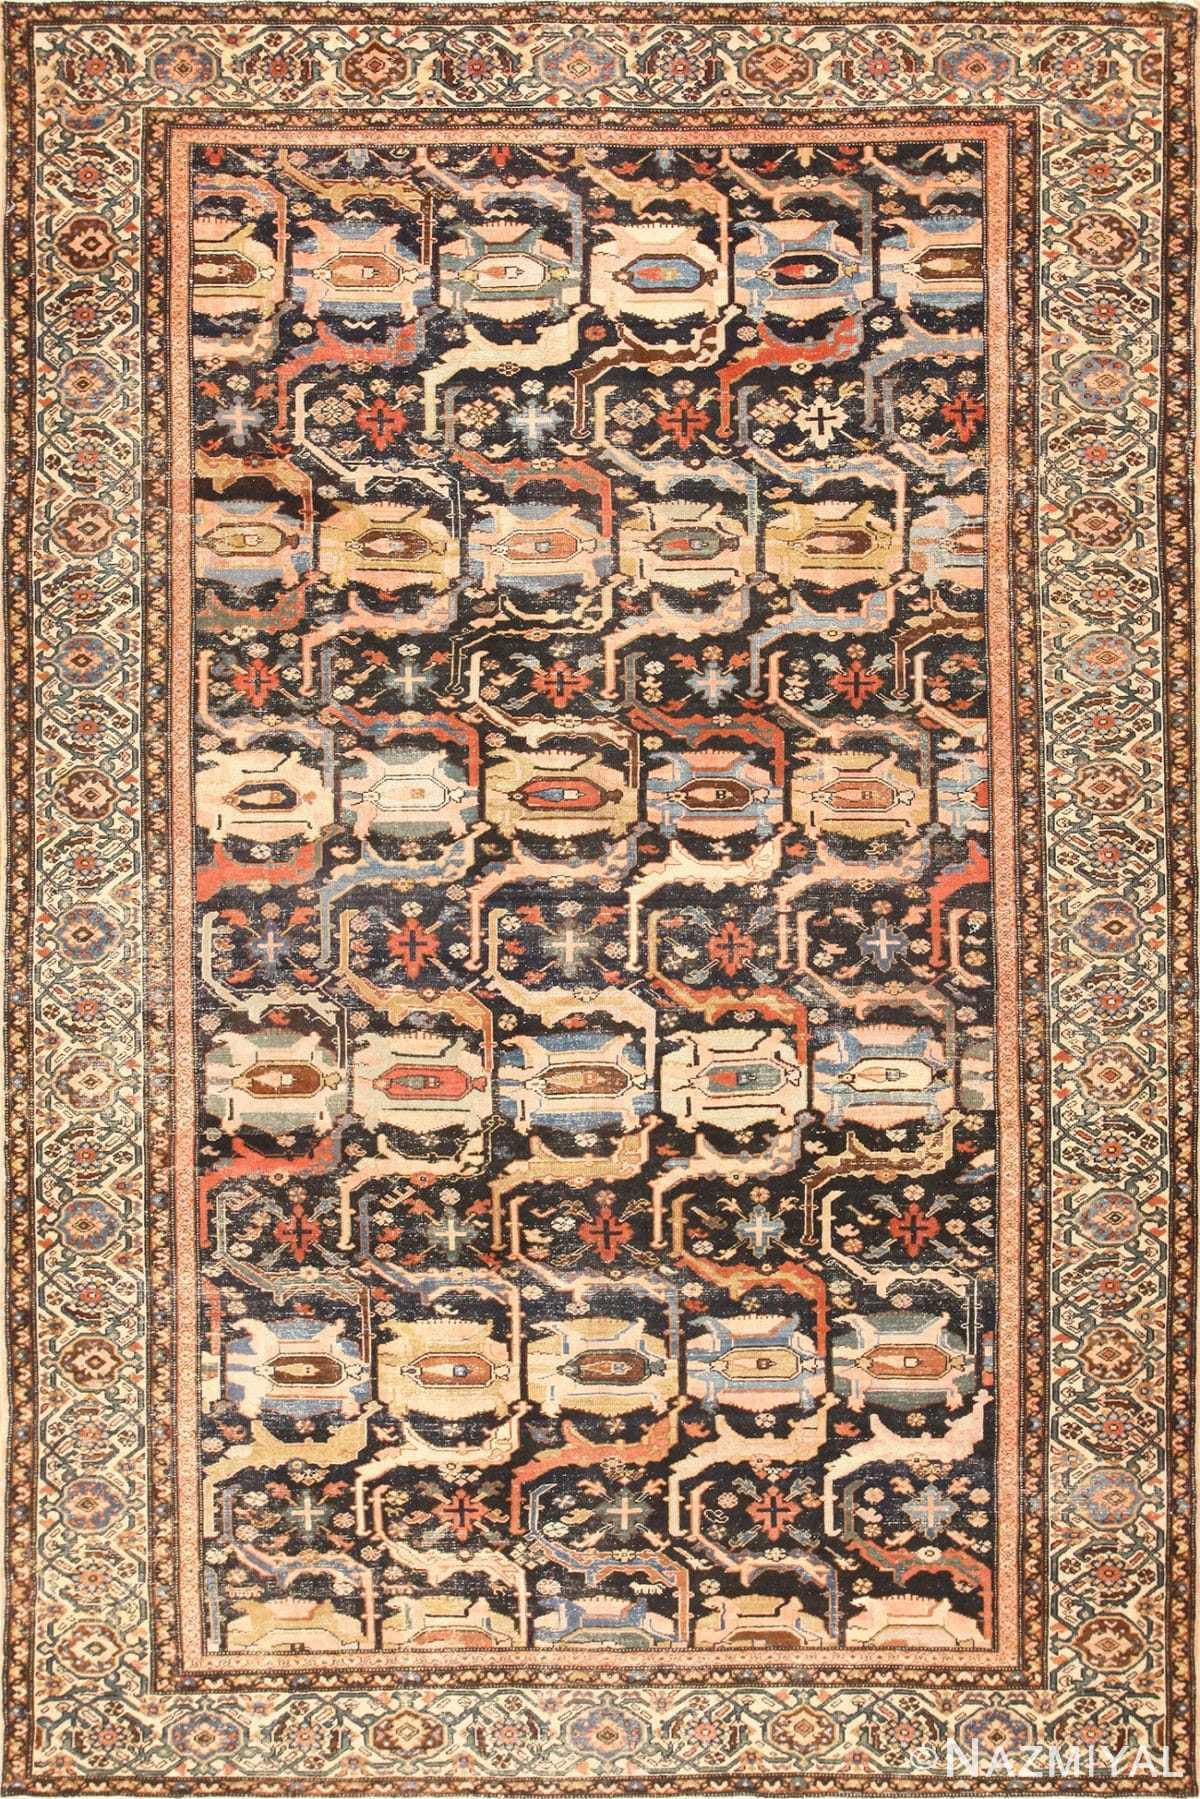 Antique Tribal Shabby Chic Antique Malayer Rug 48935 Nazmiyal